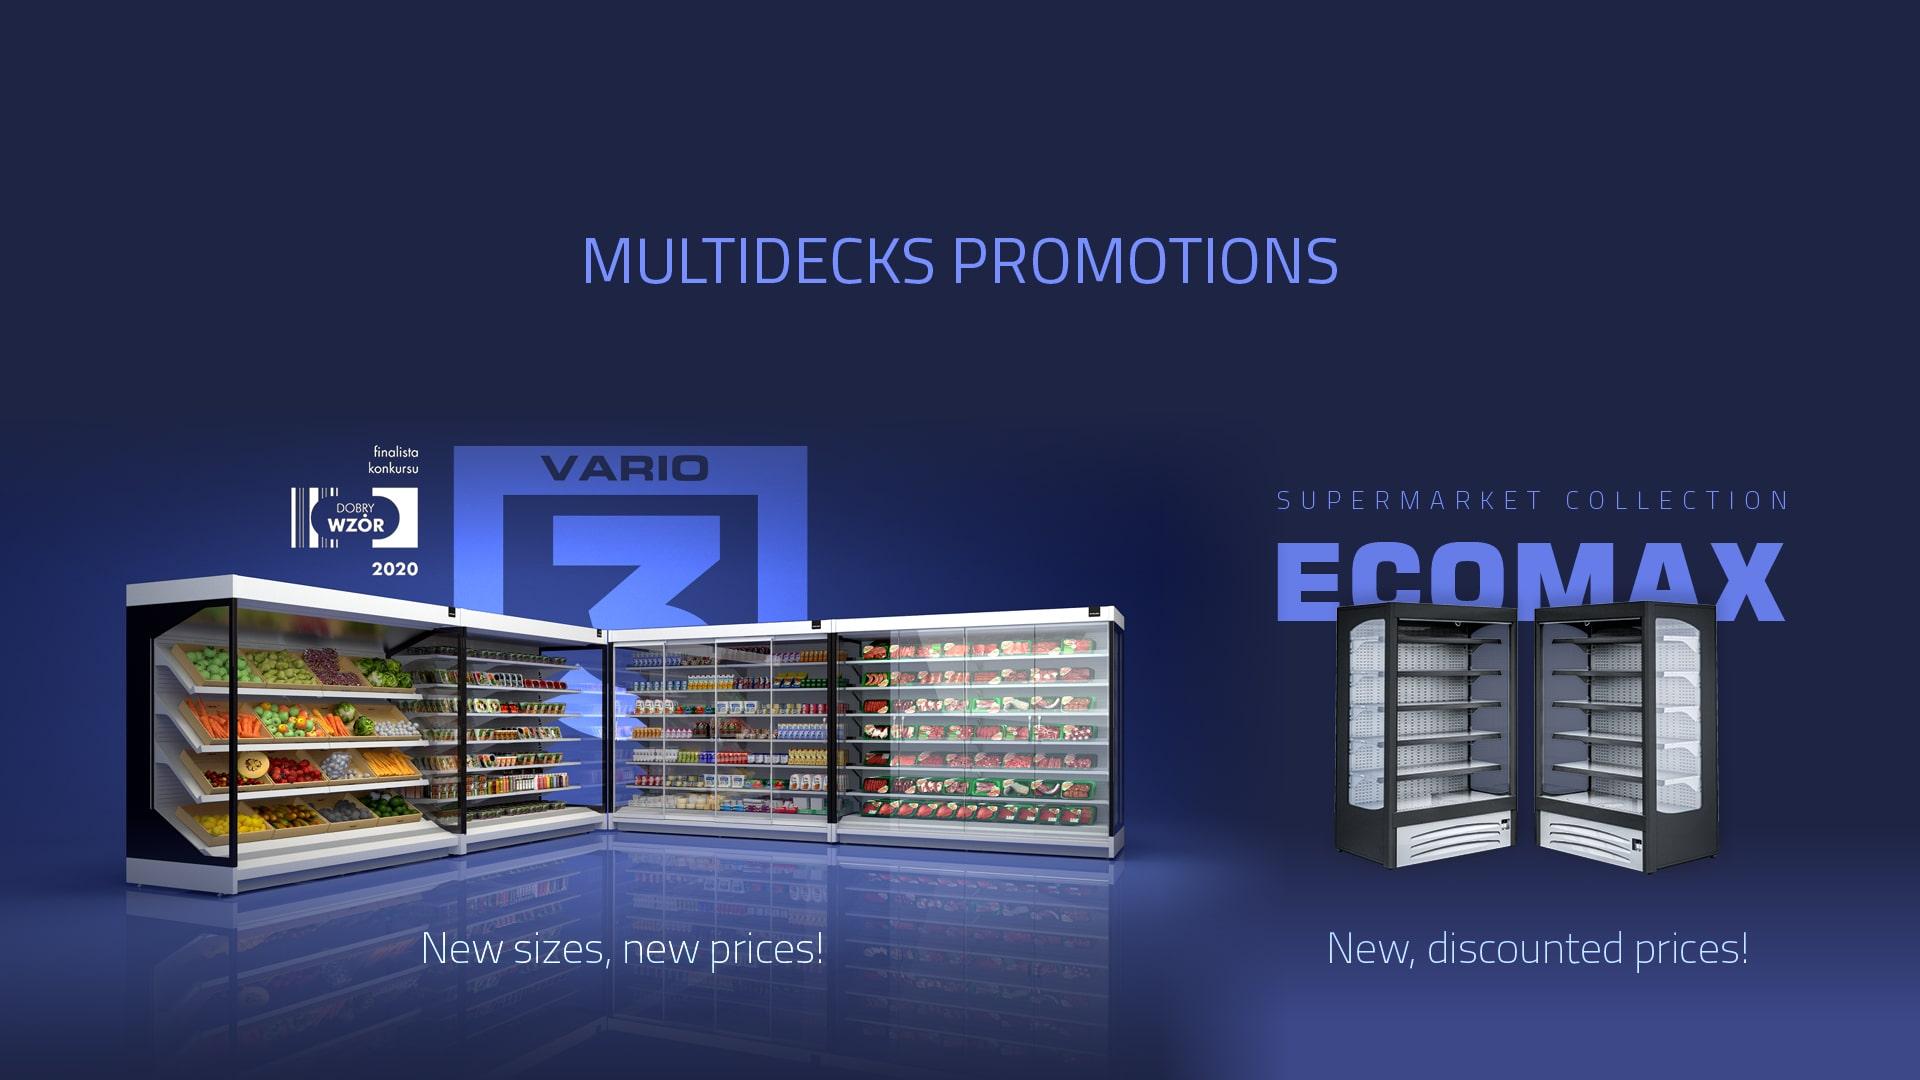 Multidecks promotion